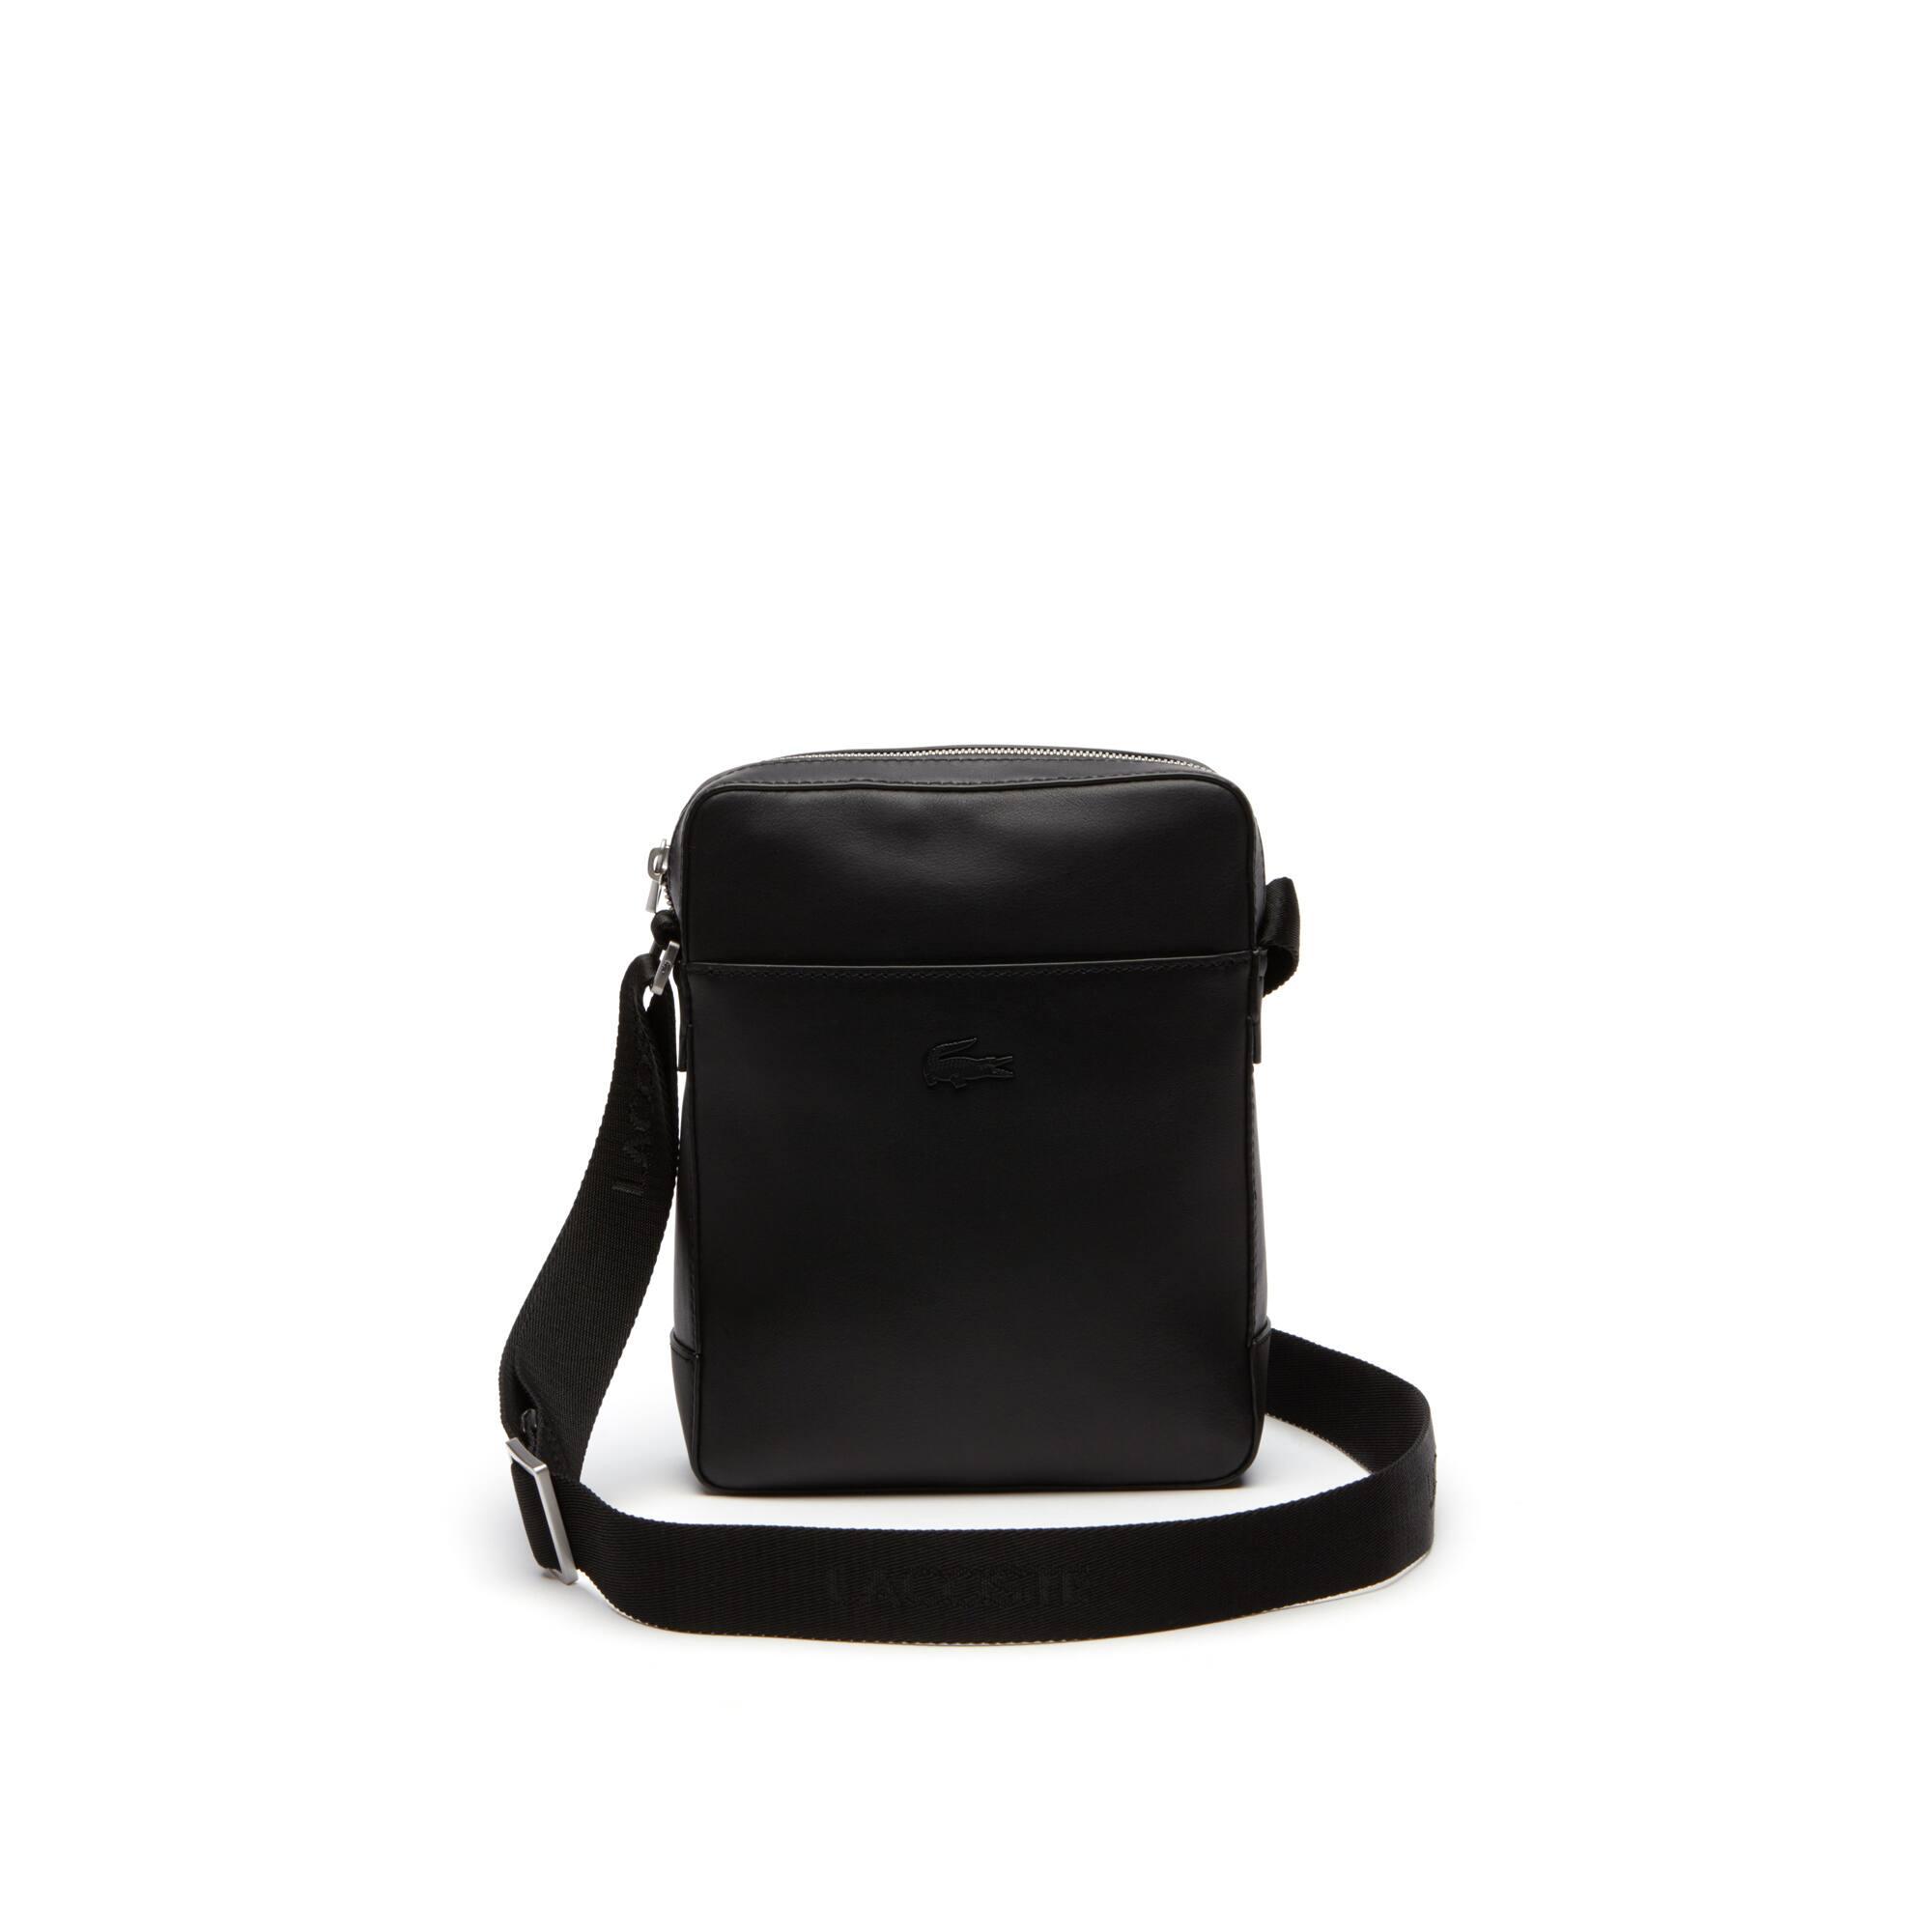 Men's Full Ace Soft Leather Bag